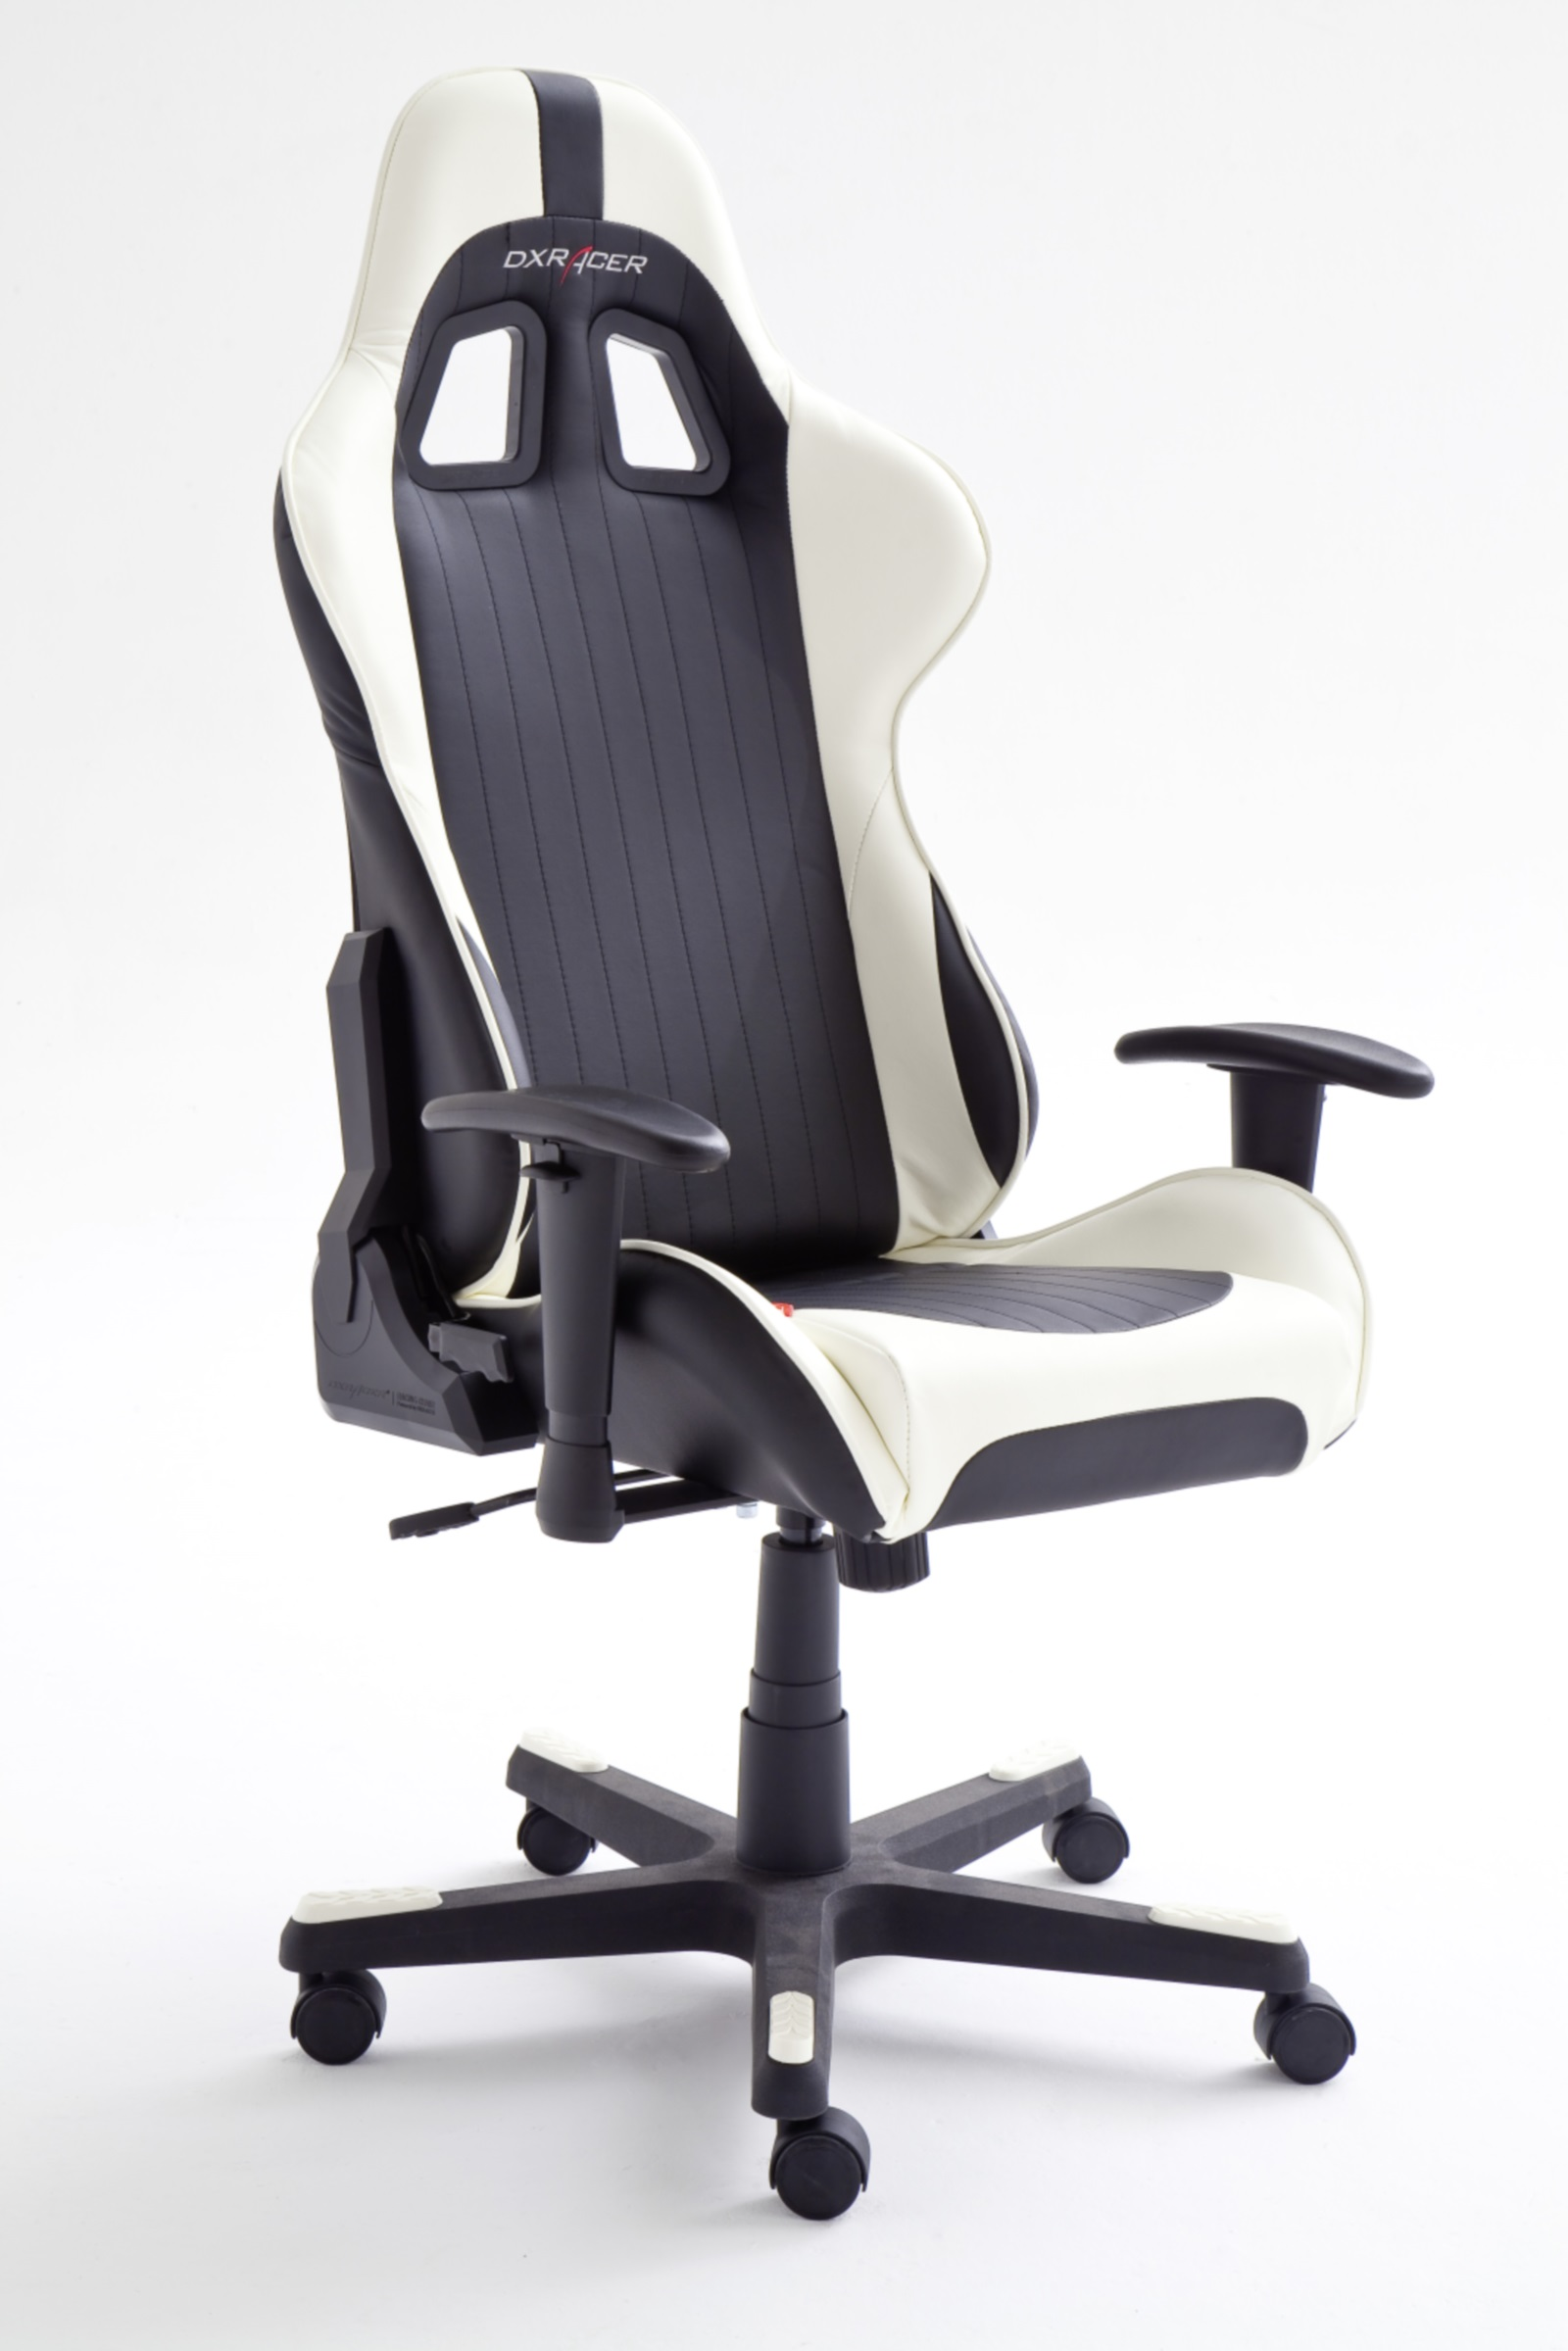 dxracer 6 gamer chair drehstuhl b rostuhl computerstuhl schwarz wei ebay. Black Bedroom Furniture Sets. Home Design Ideas